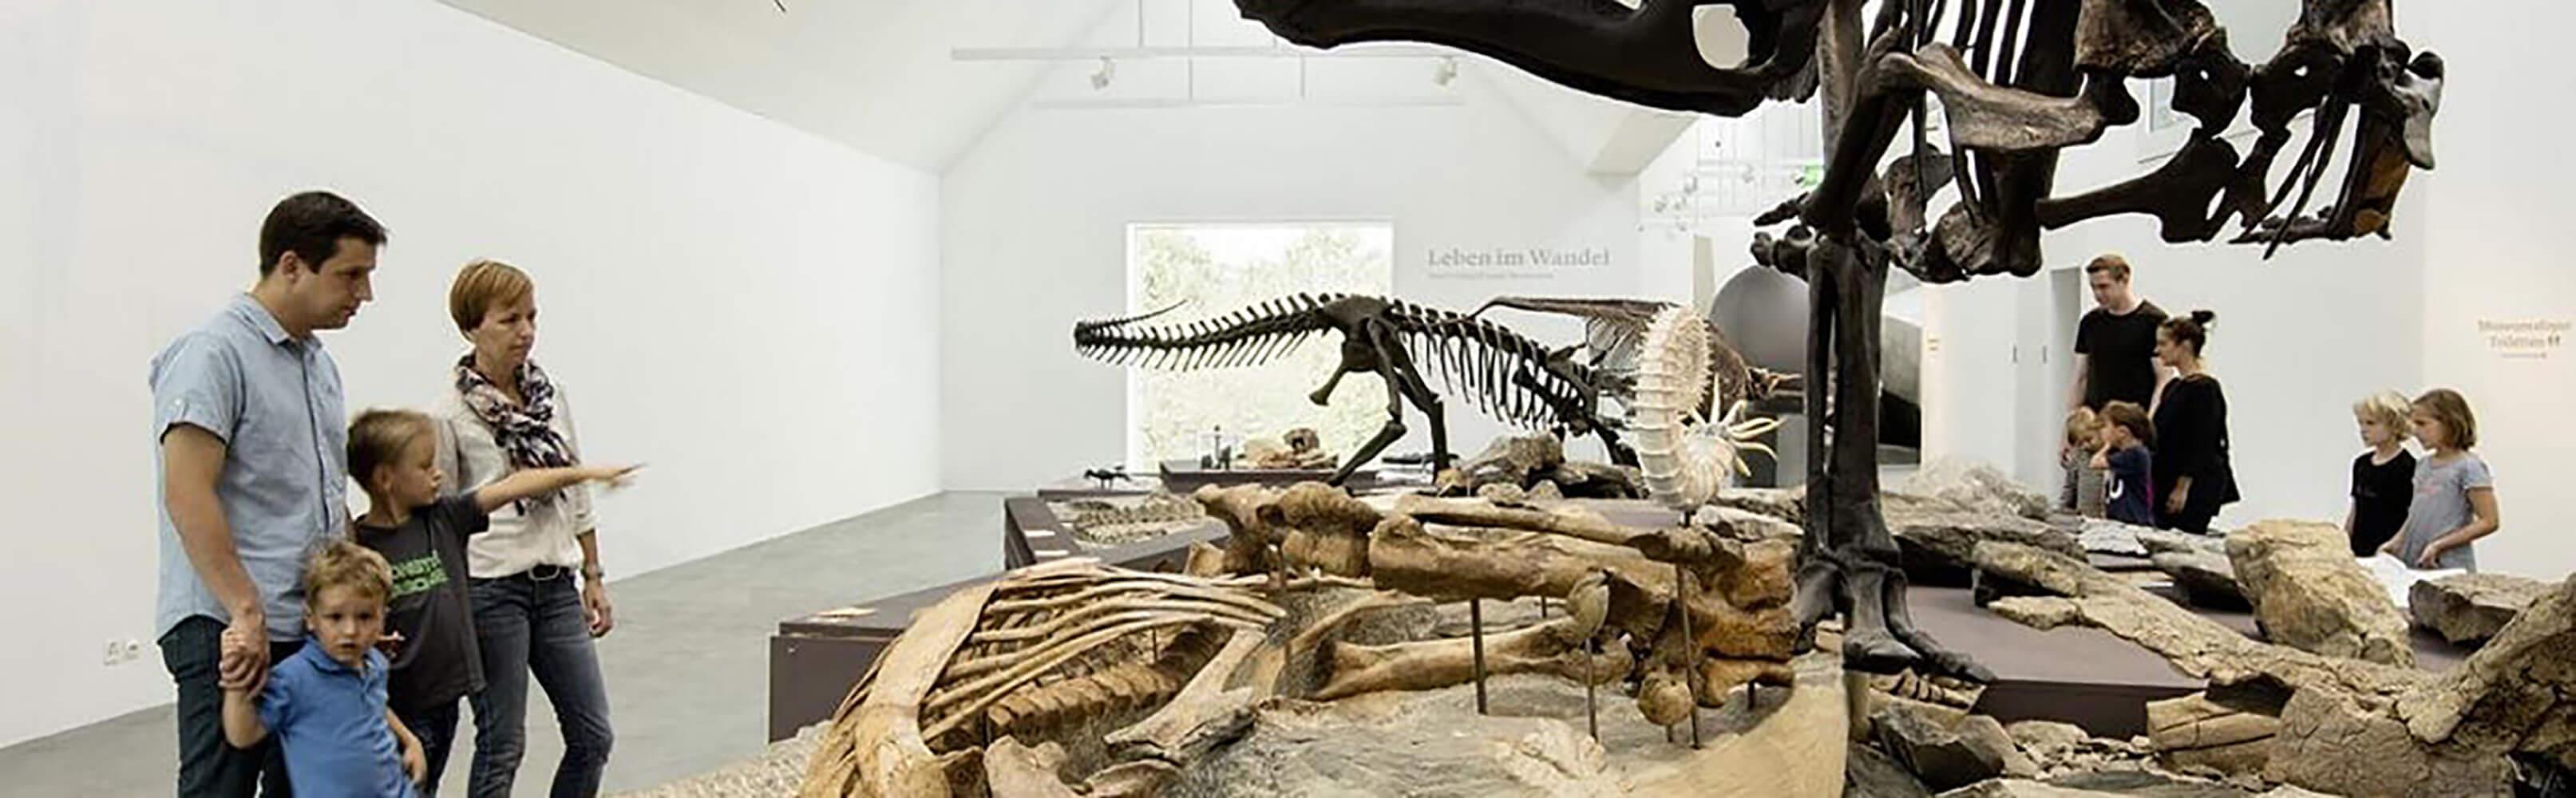 Naturmuseum St.Gallen 1